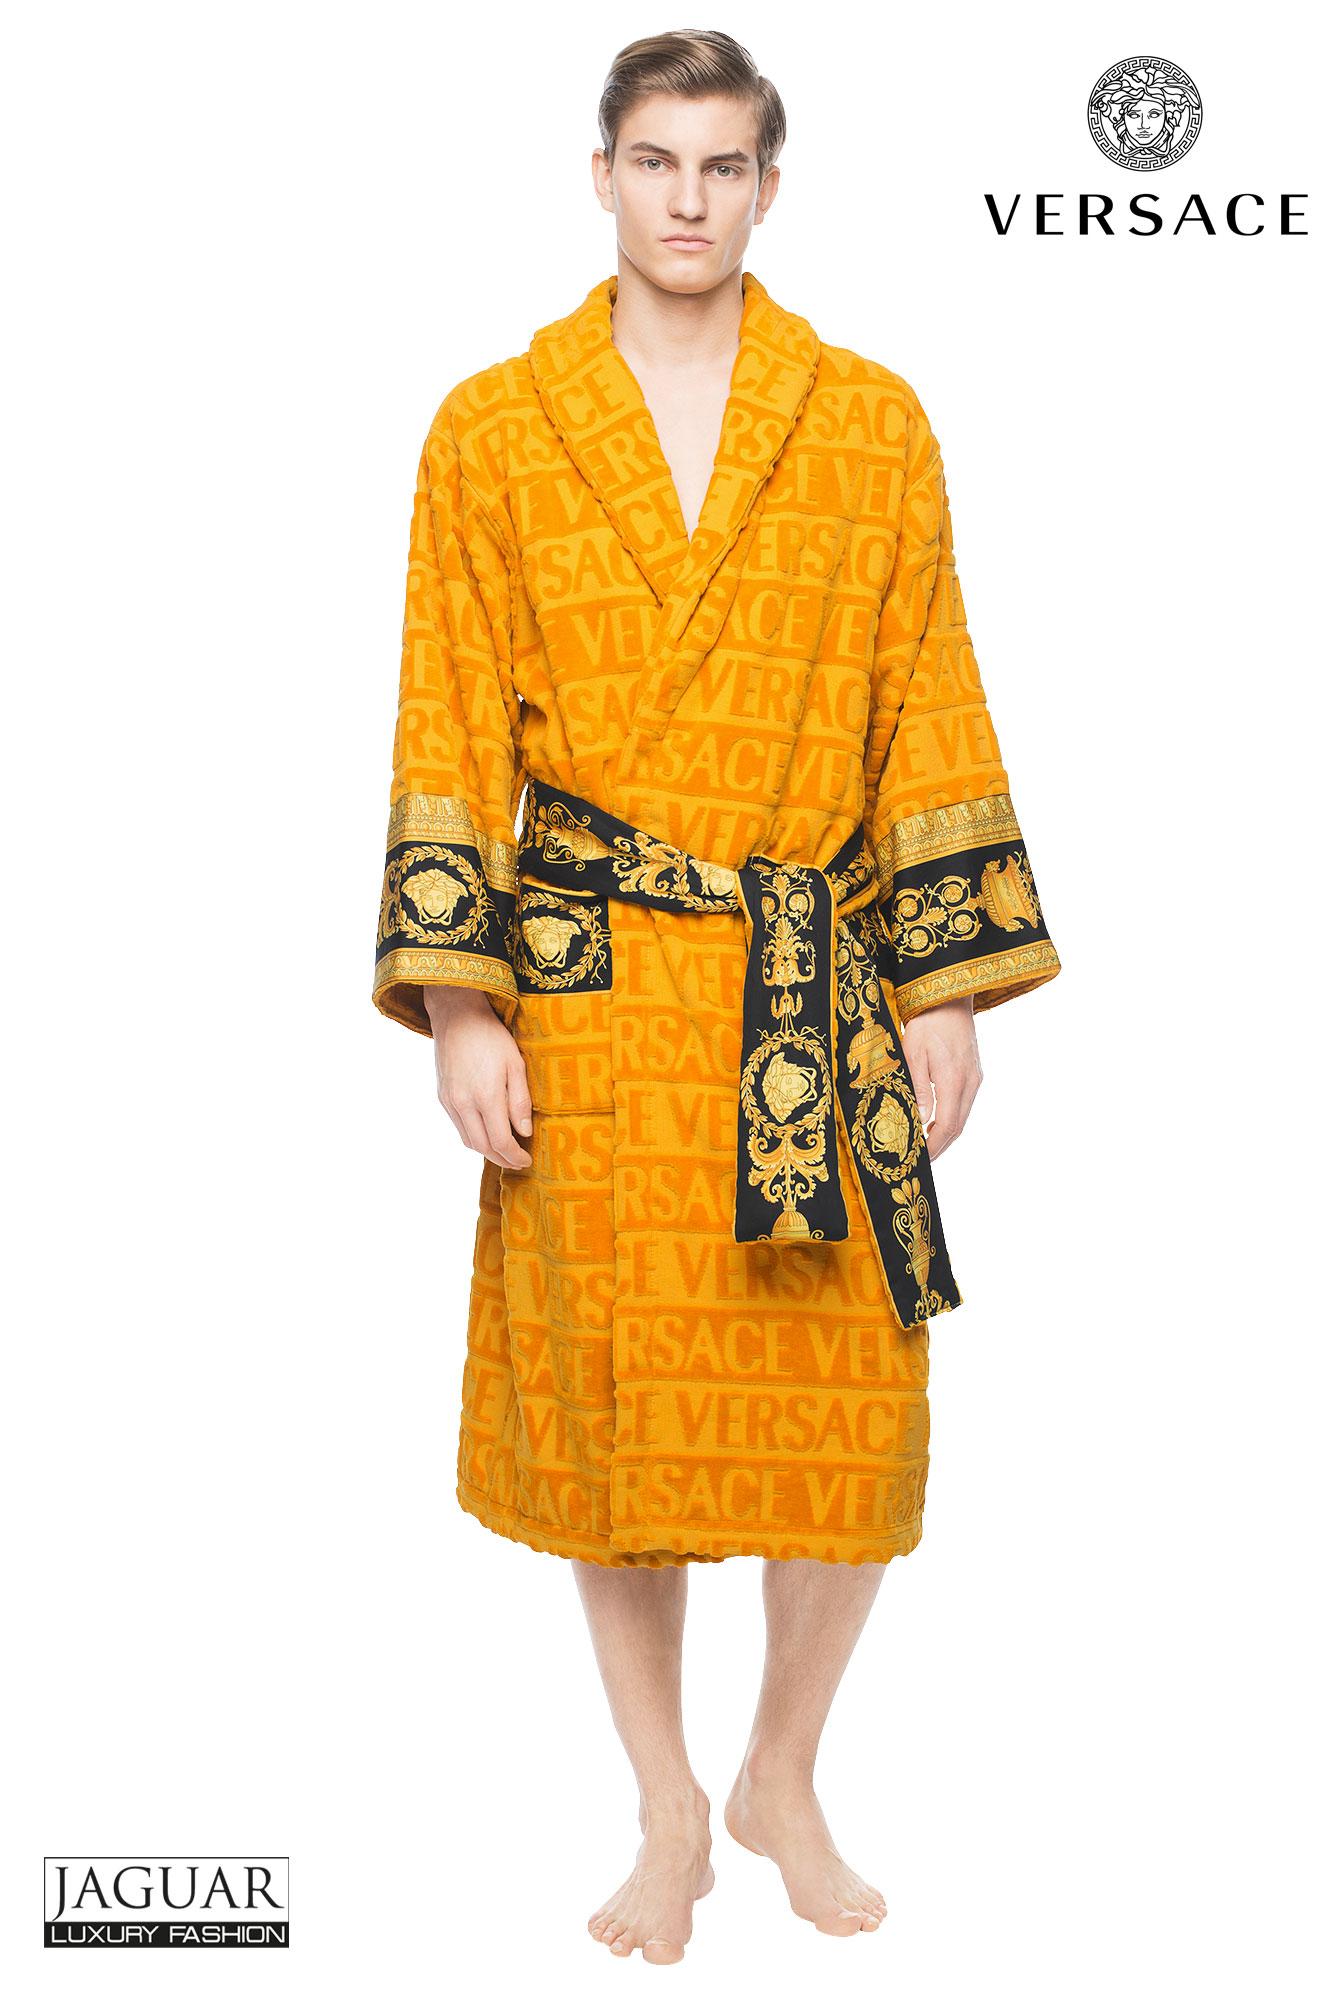 Versace I ♡ baroque bathrobe oro – JAGUAR MODE 3f14604df